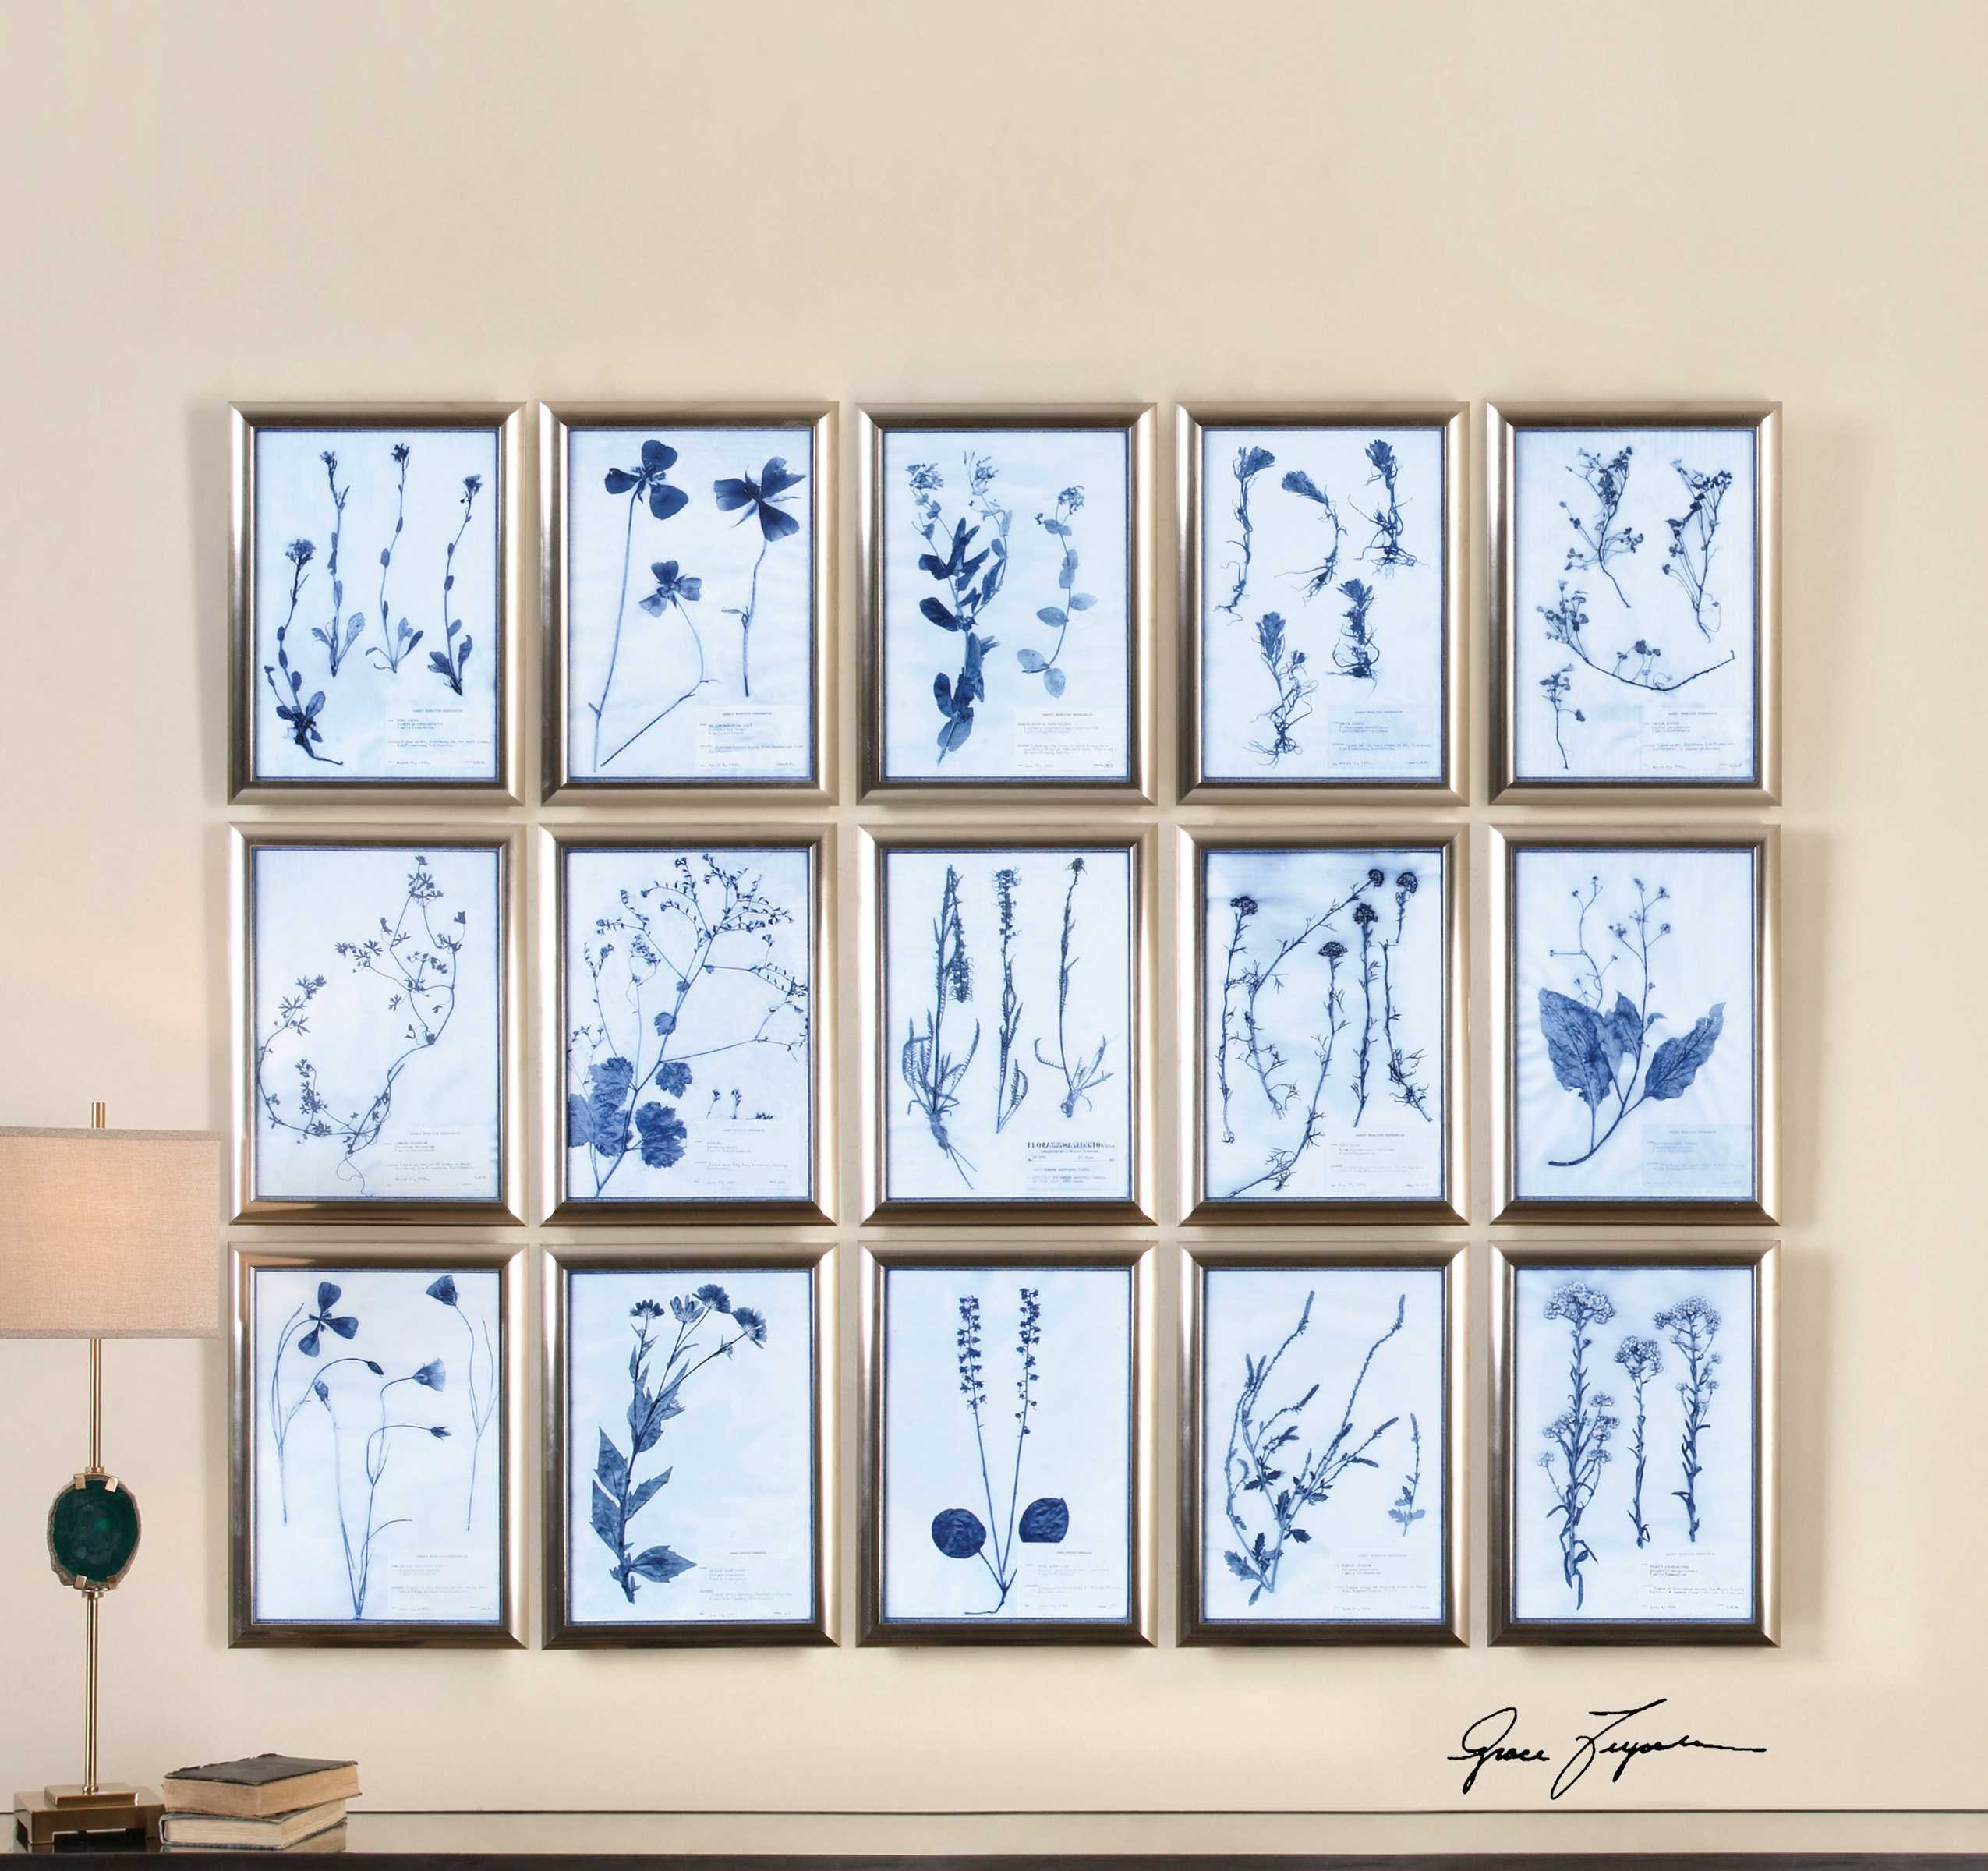 Uttermost Dried Flowers Floral Wall Art (15 Piece Set) | UT33609